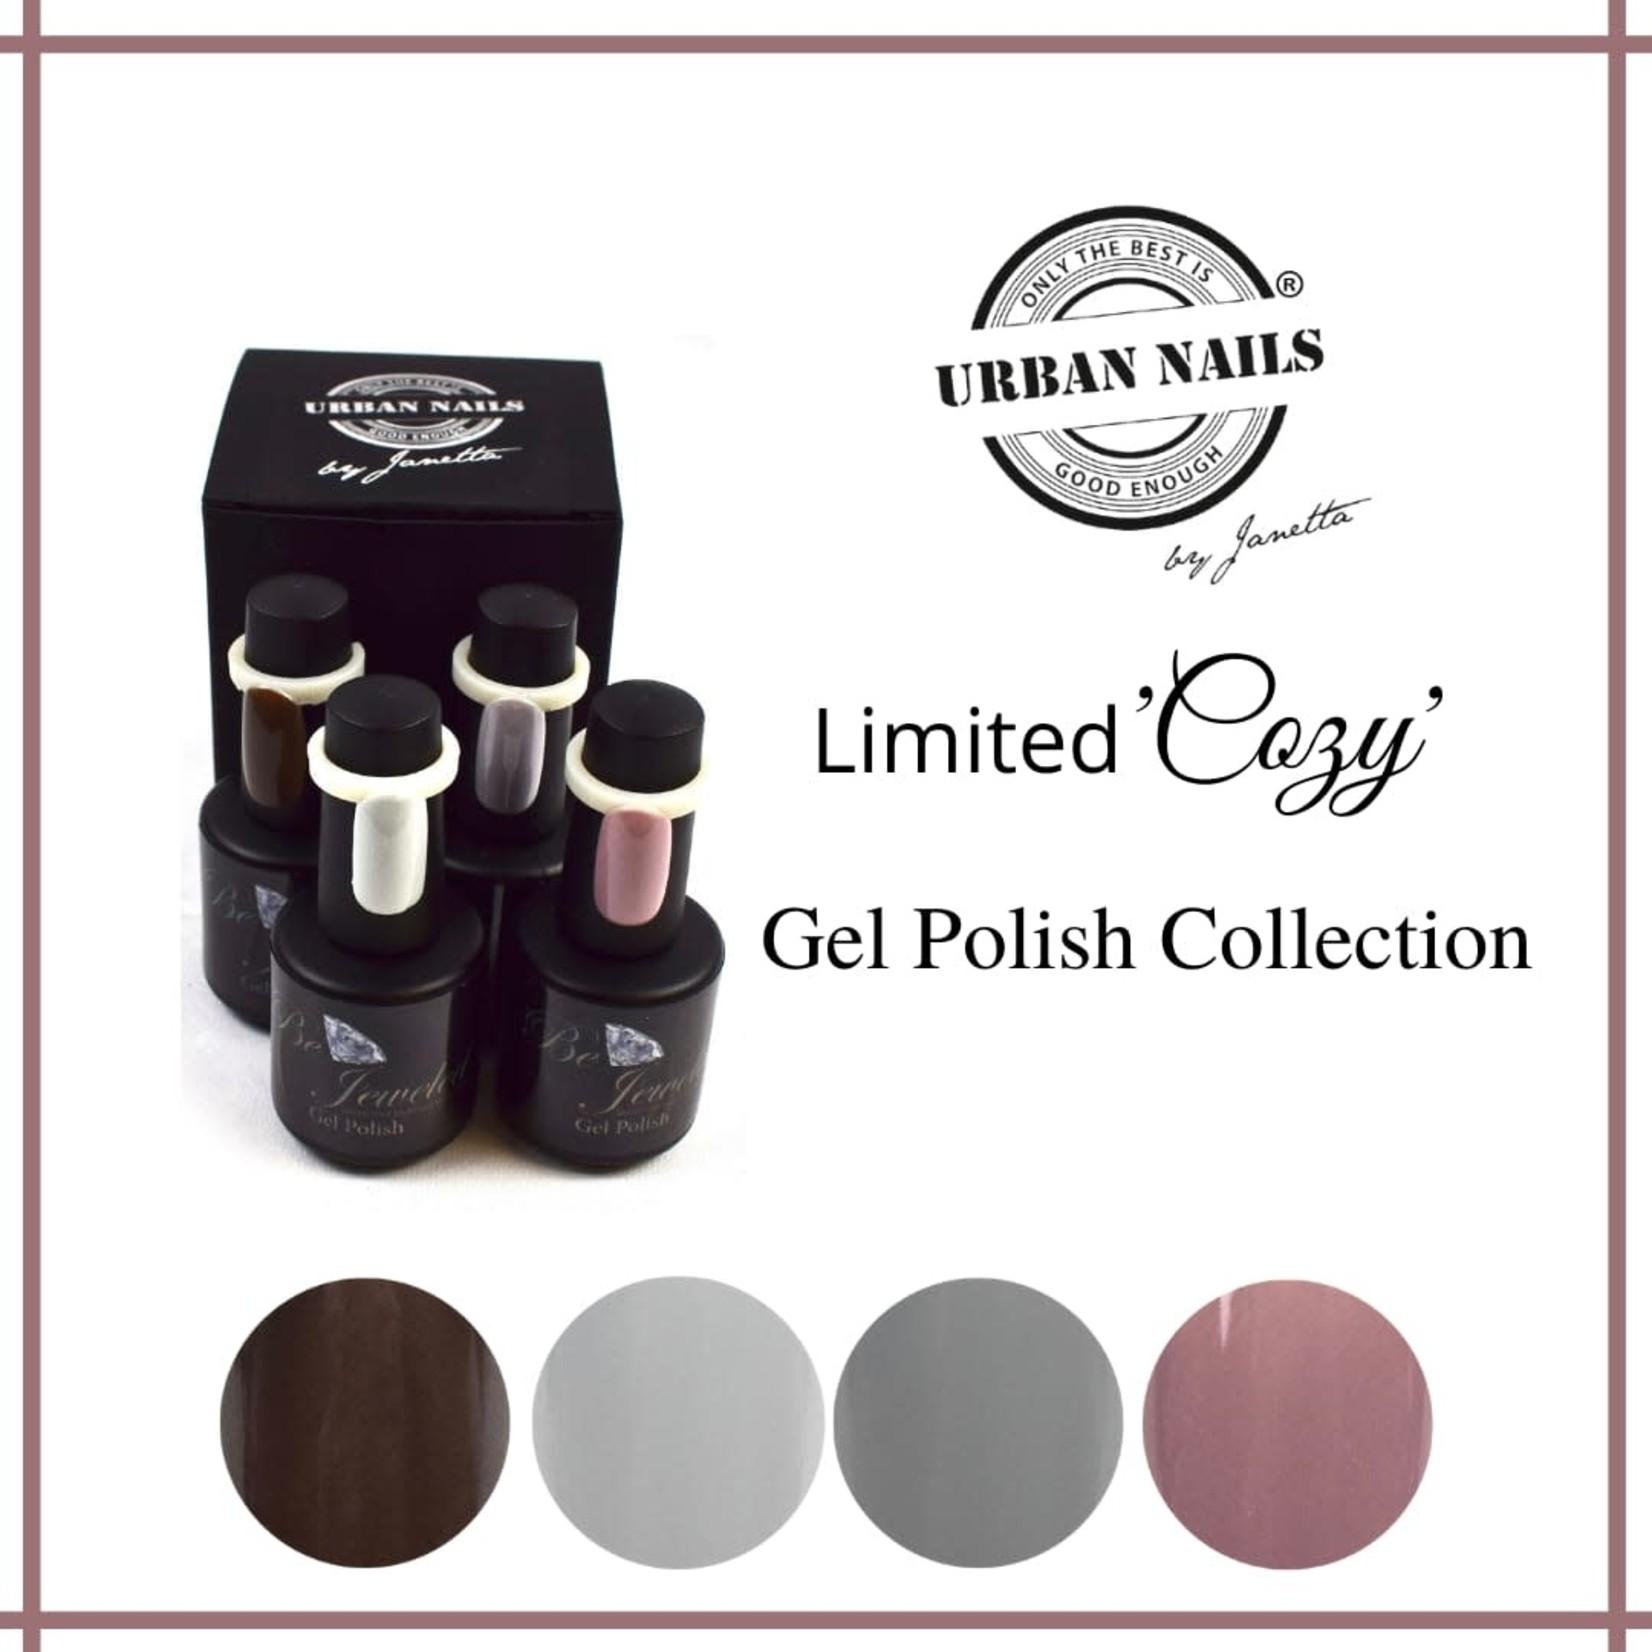 Urban Nails Cozy Limited Gelpolish collection